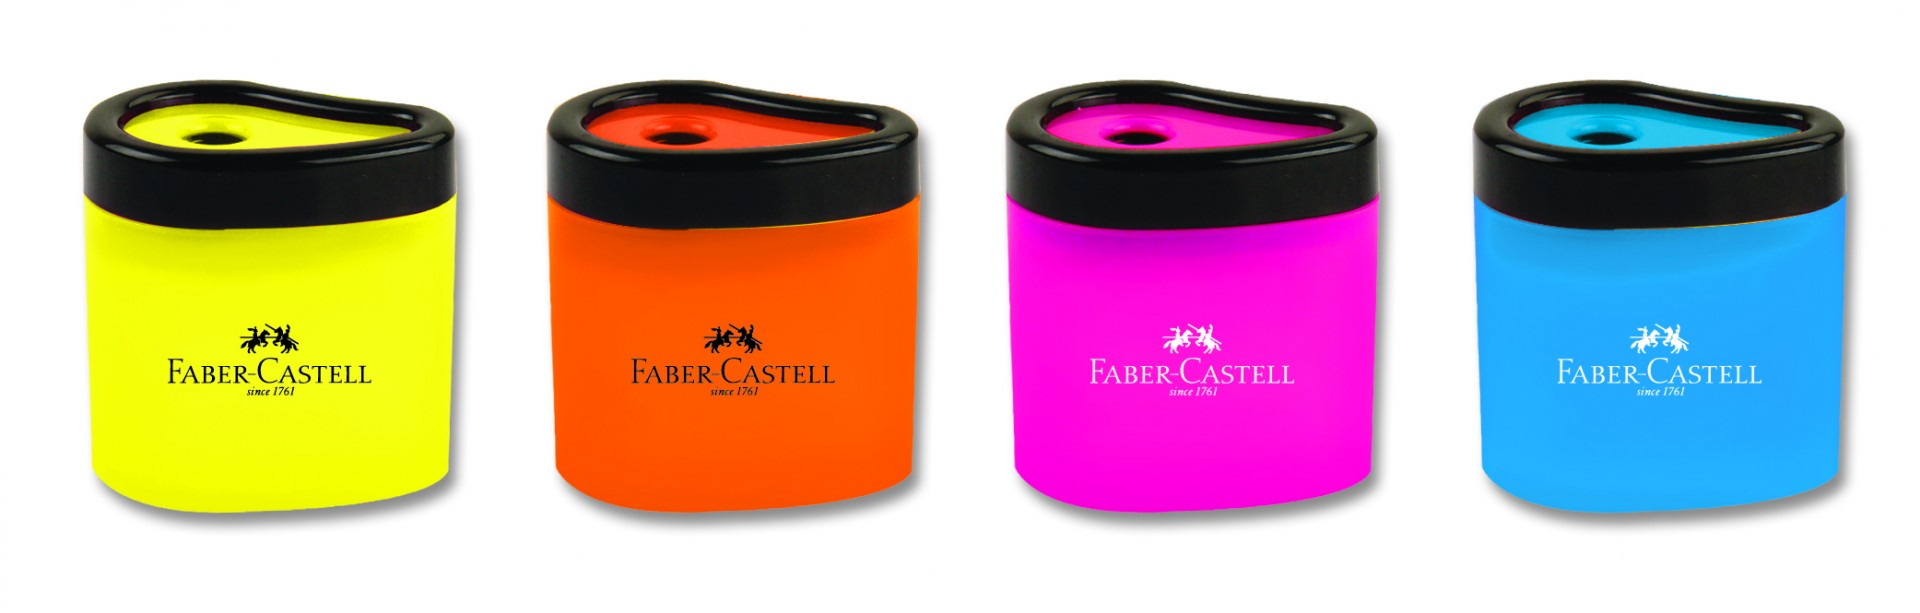 Faber Castell 440000 Damla Şekilli Kalemtraş